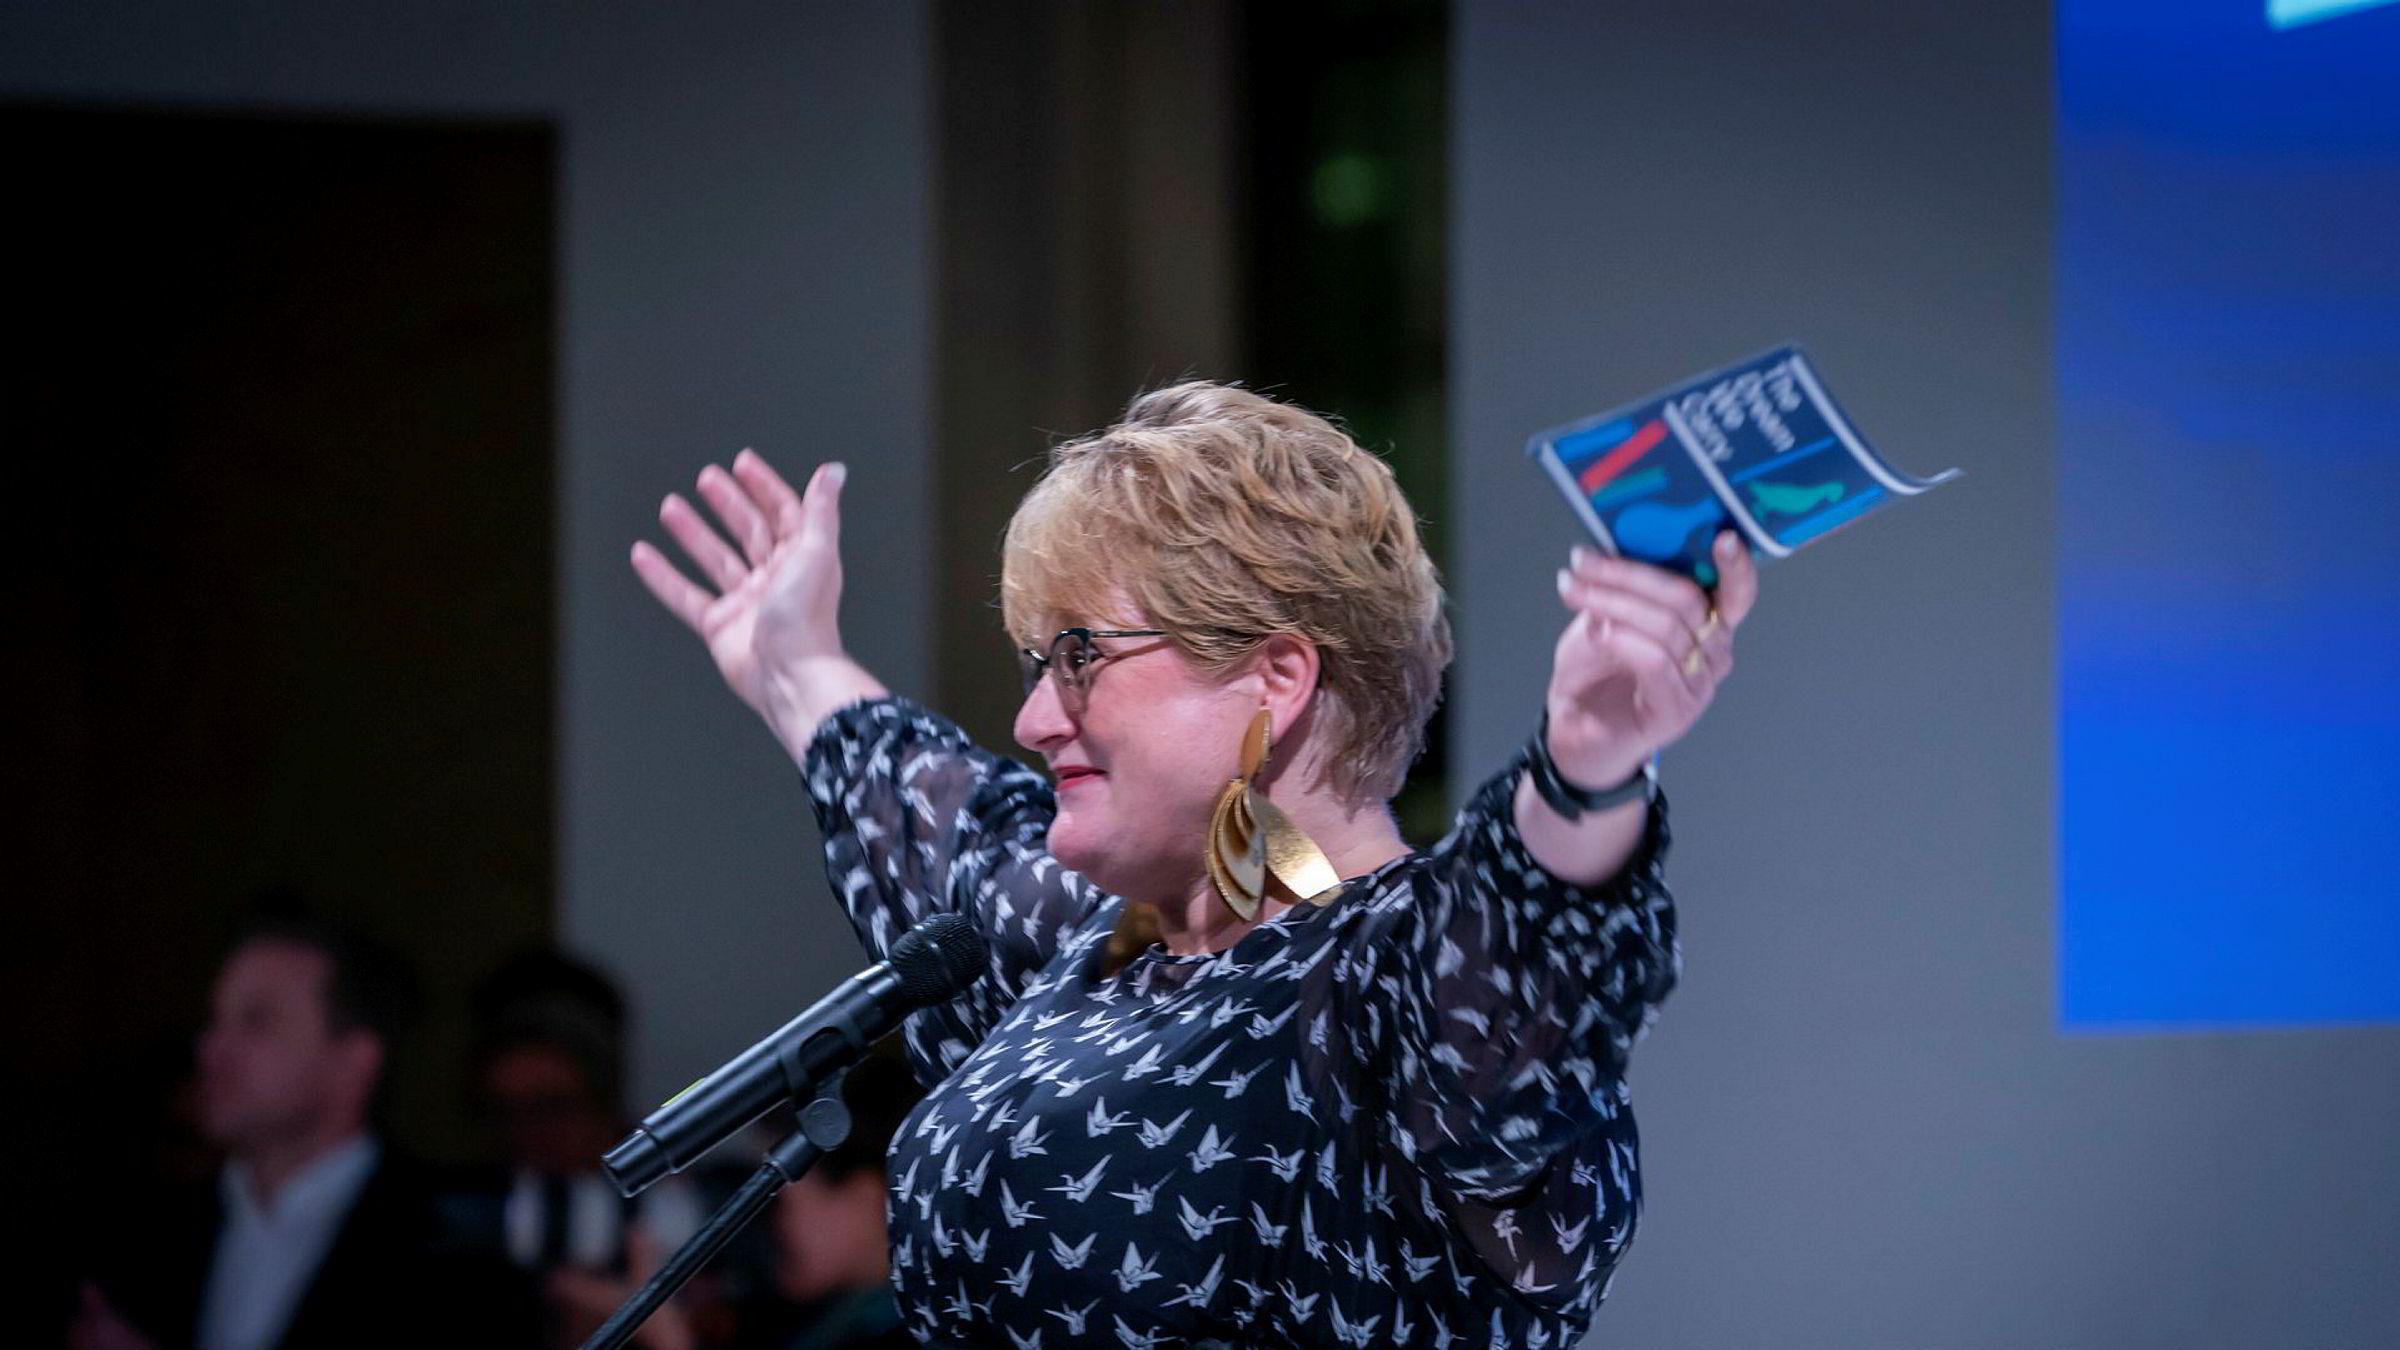 Kulturminister og Venstre-leder Trine Skei Grande henviser alle spørsmål om Venstres partiledelse til valgkomiteen.